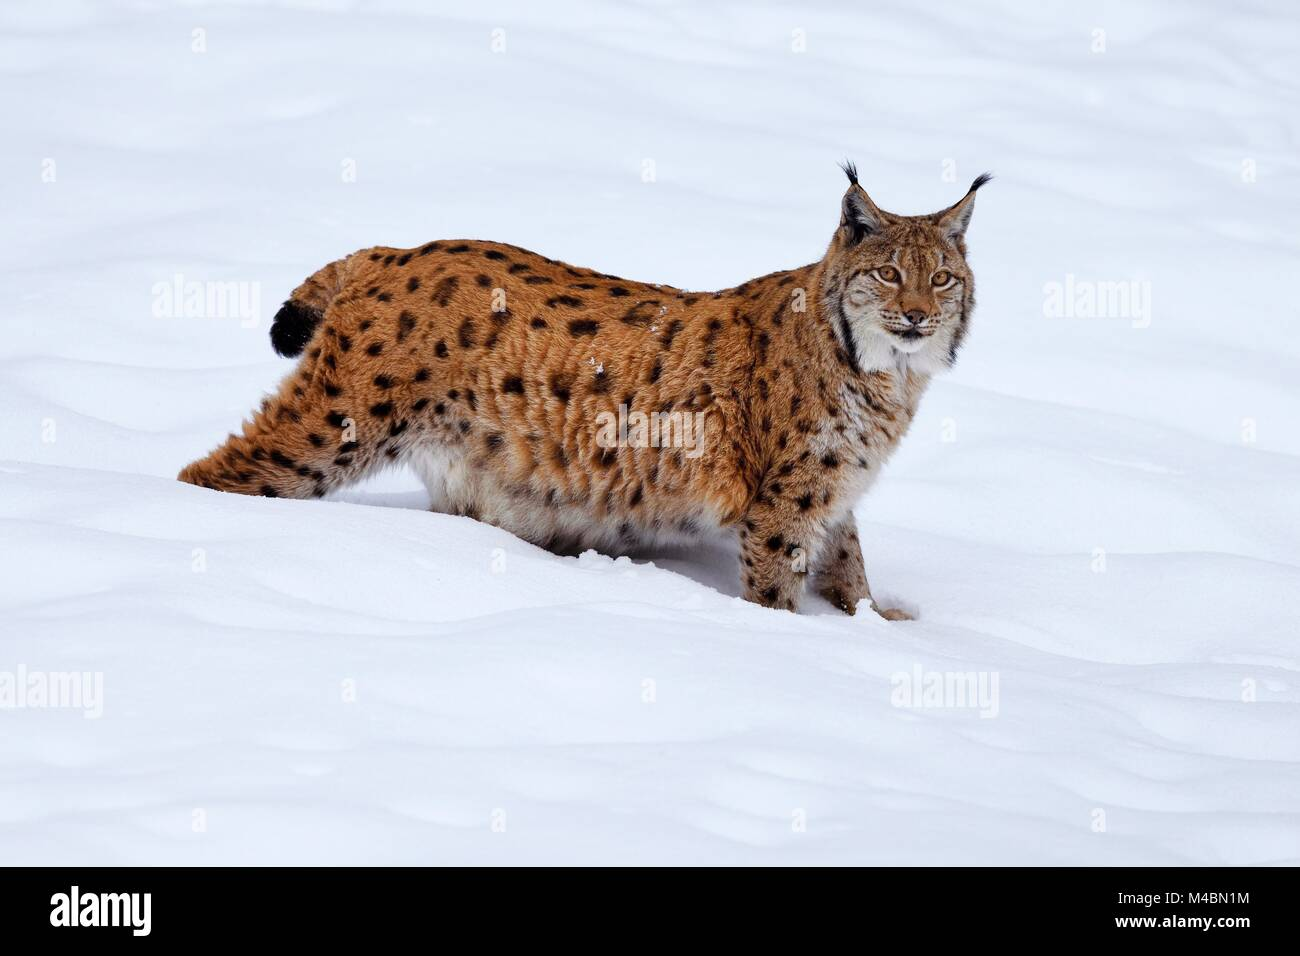 Eurasian lynx (Lynx lynx),standing in the snow,captive,Germany - Stock Image